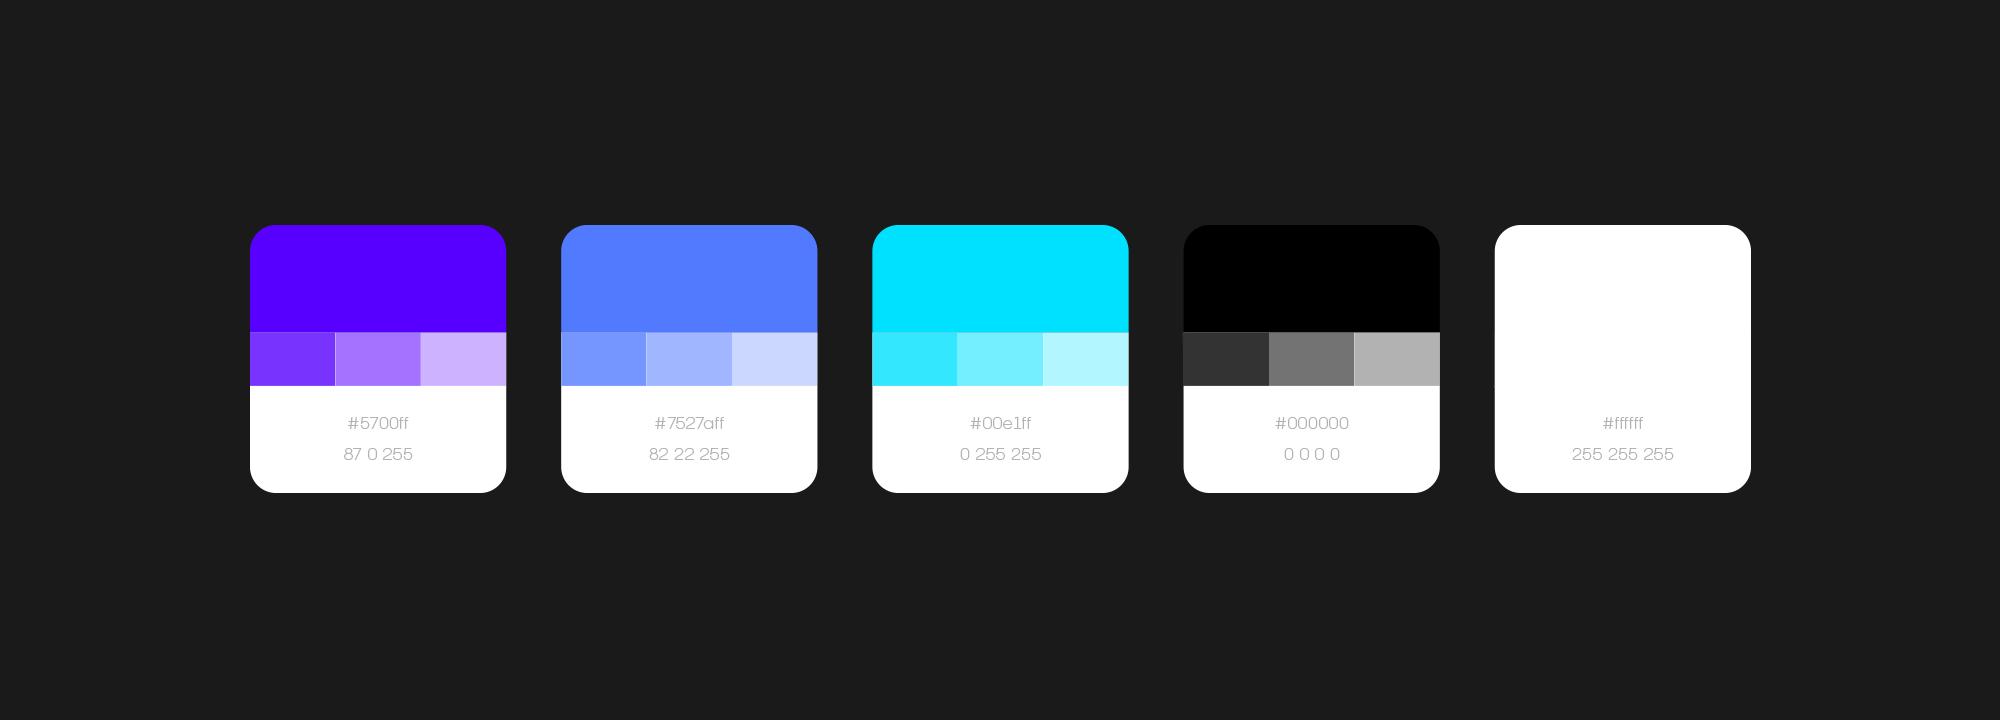 Wxllspace Colors 03